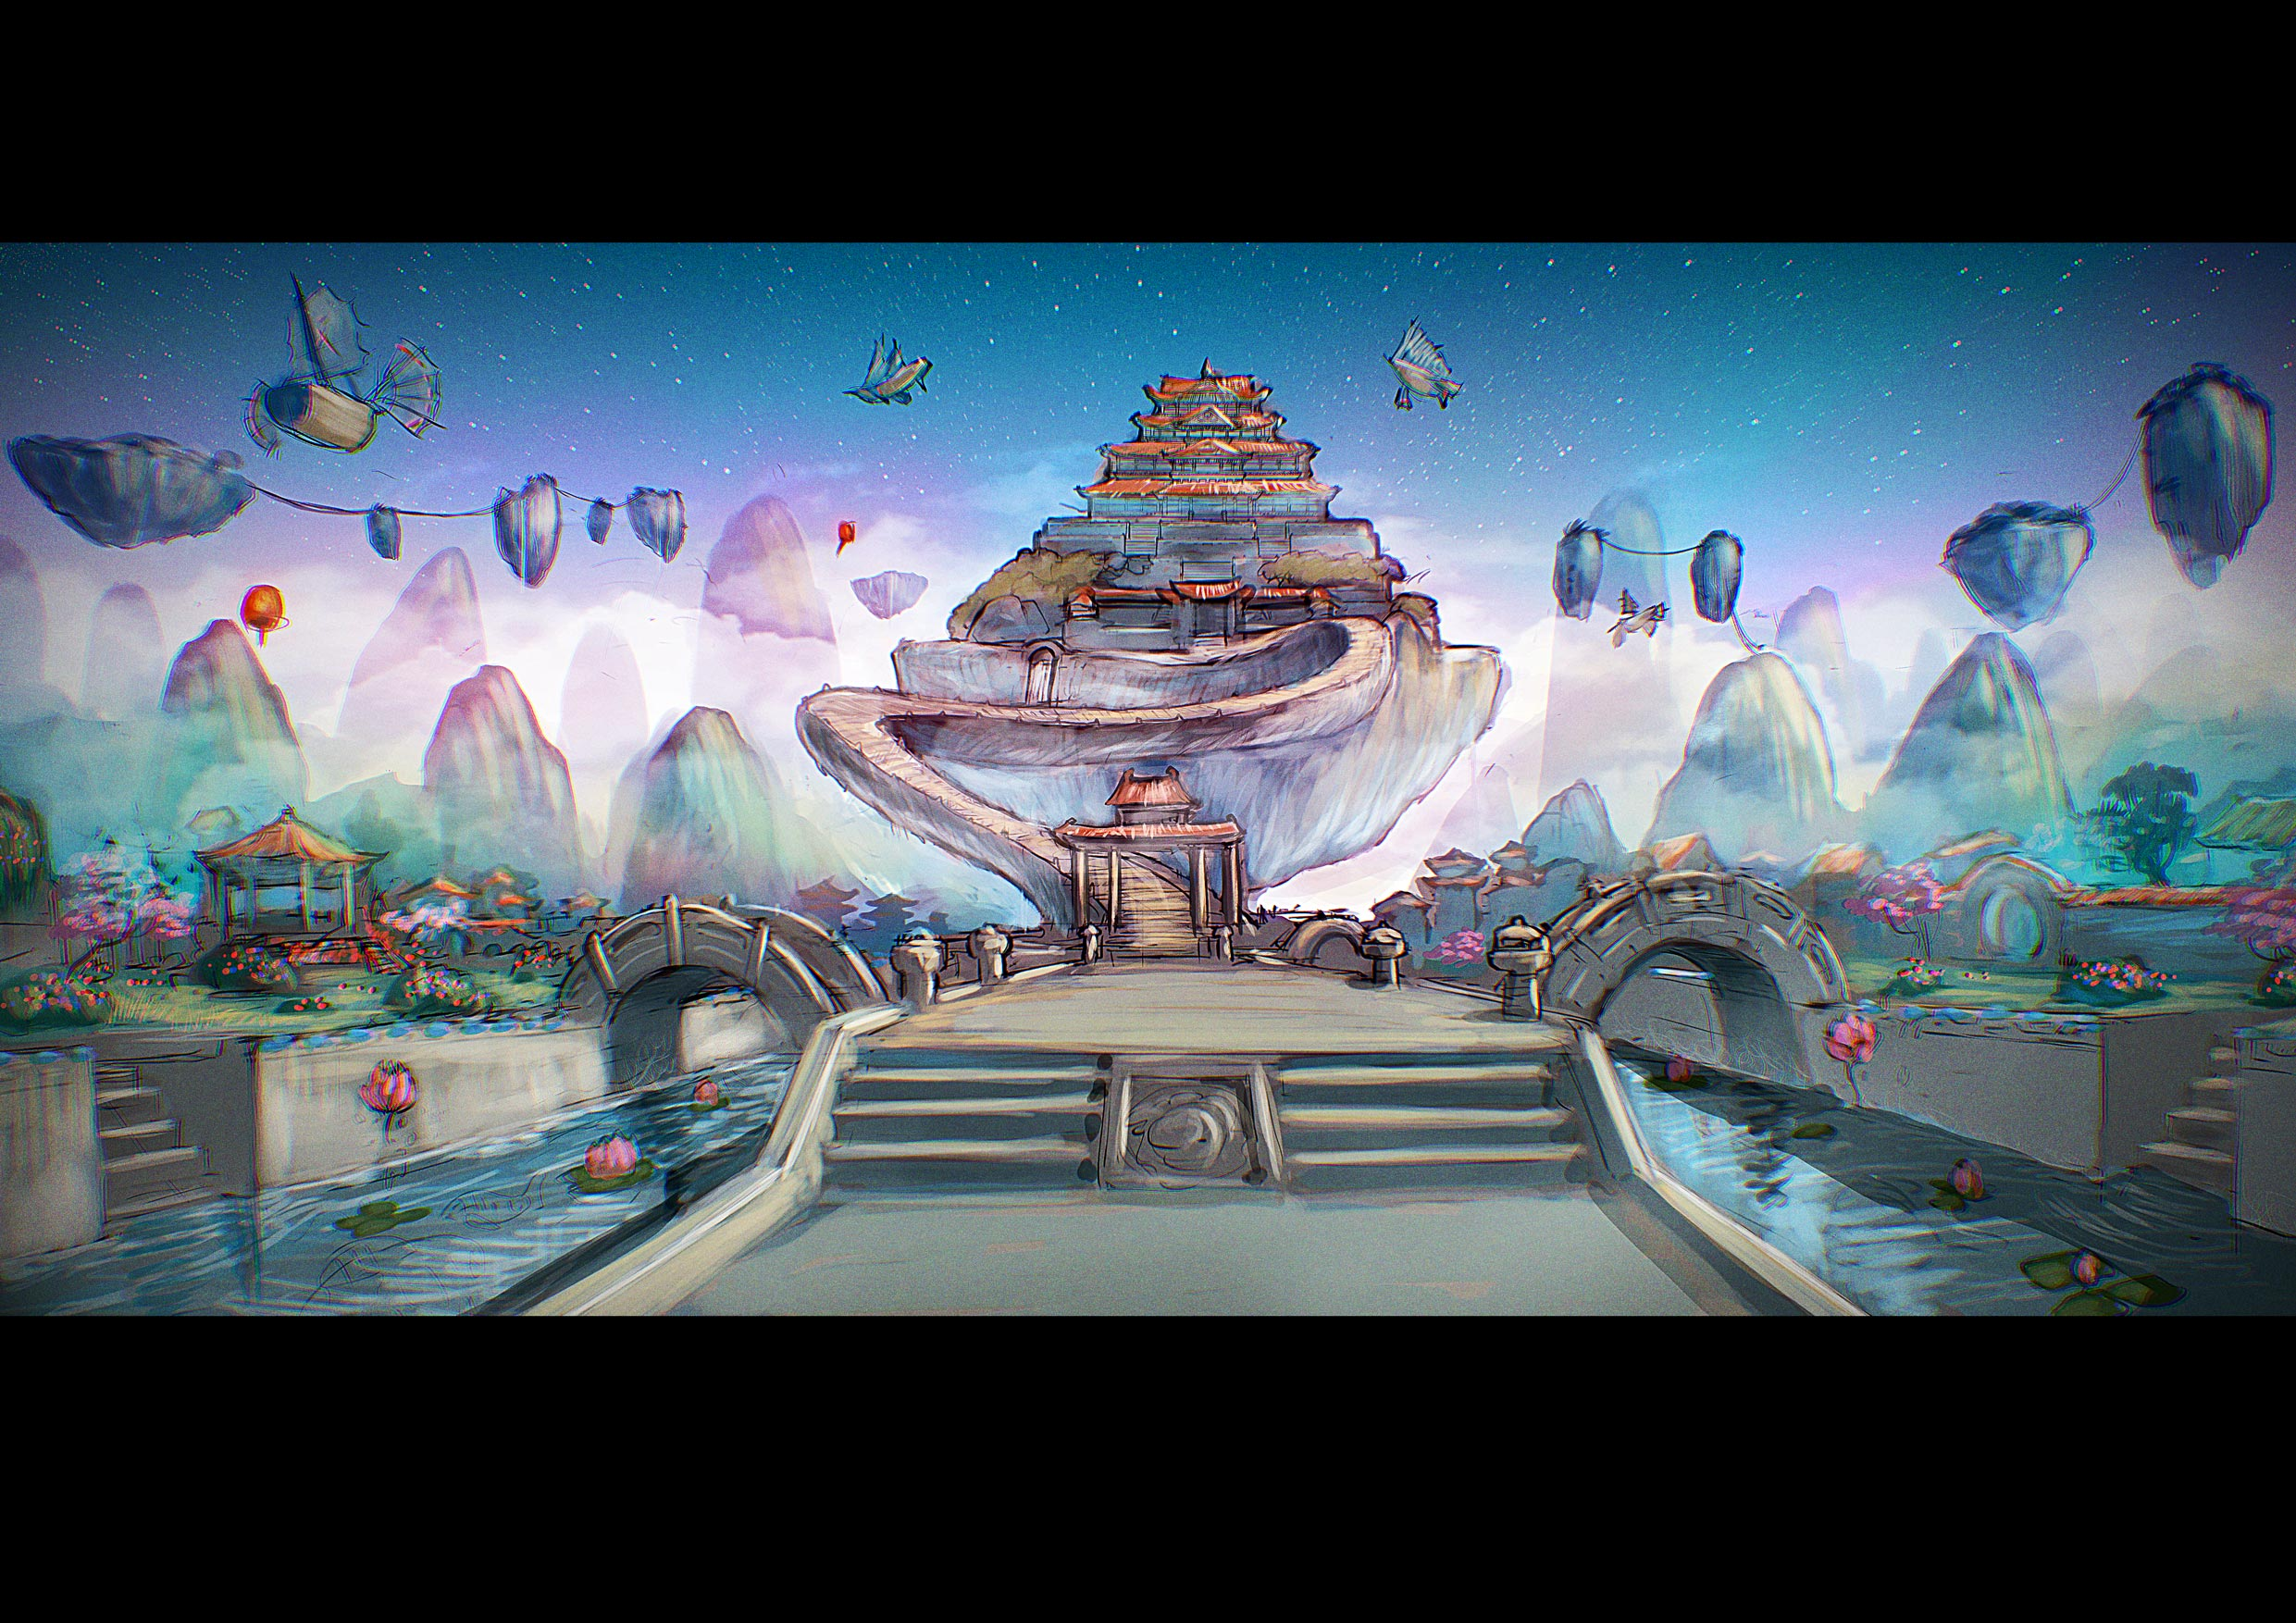 02-Superpixel_Fantasia_PalaceCourtyard_Subin_Rajendran_04.jpg